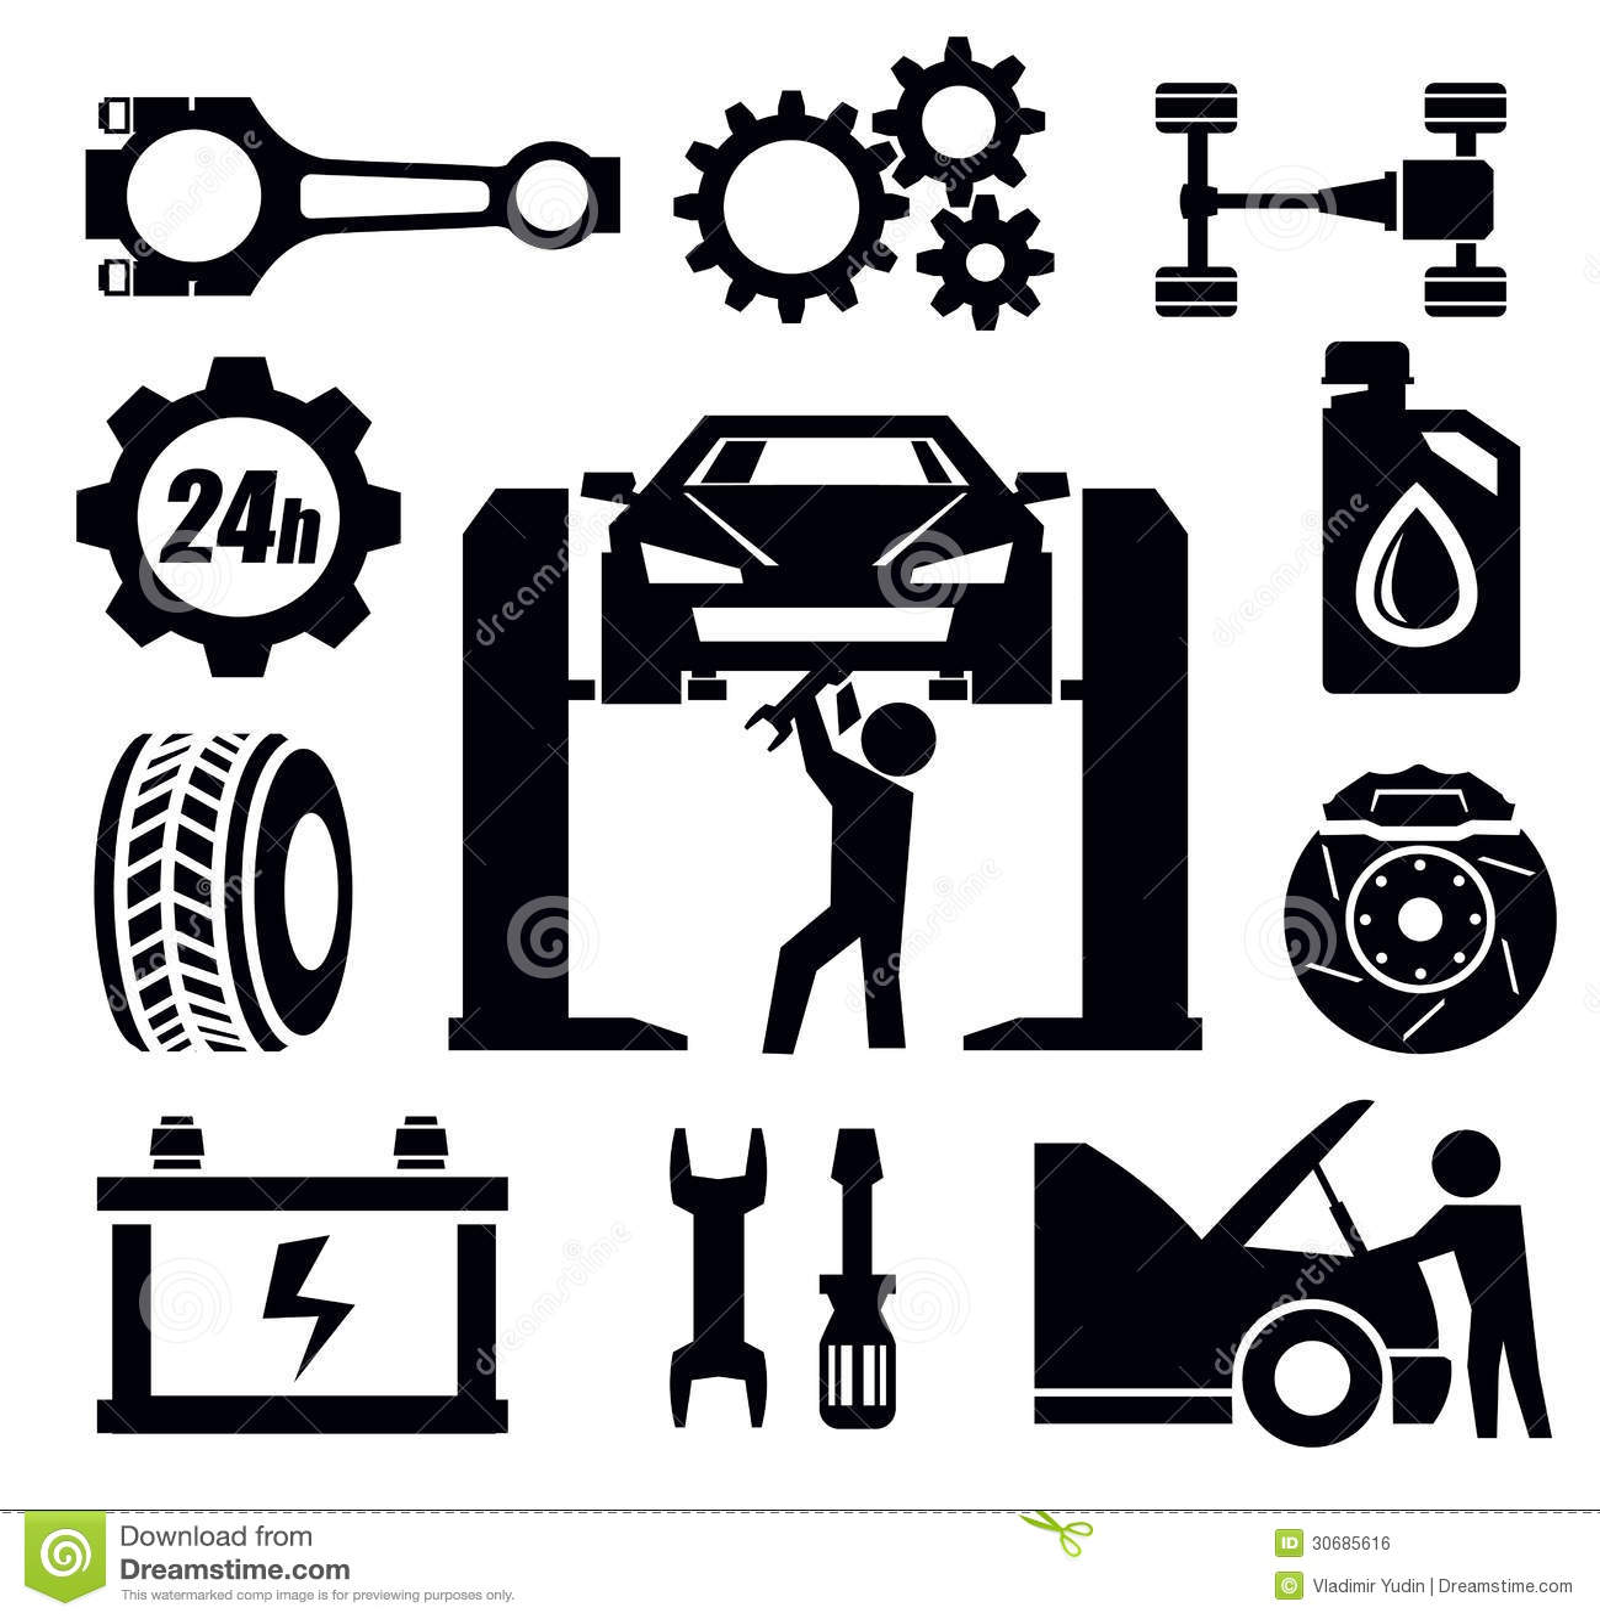 Car Repair Icon Royalty Free Stock Image